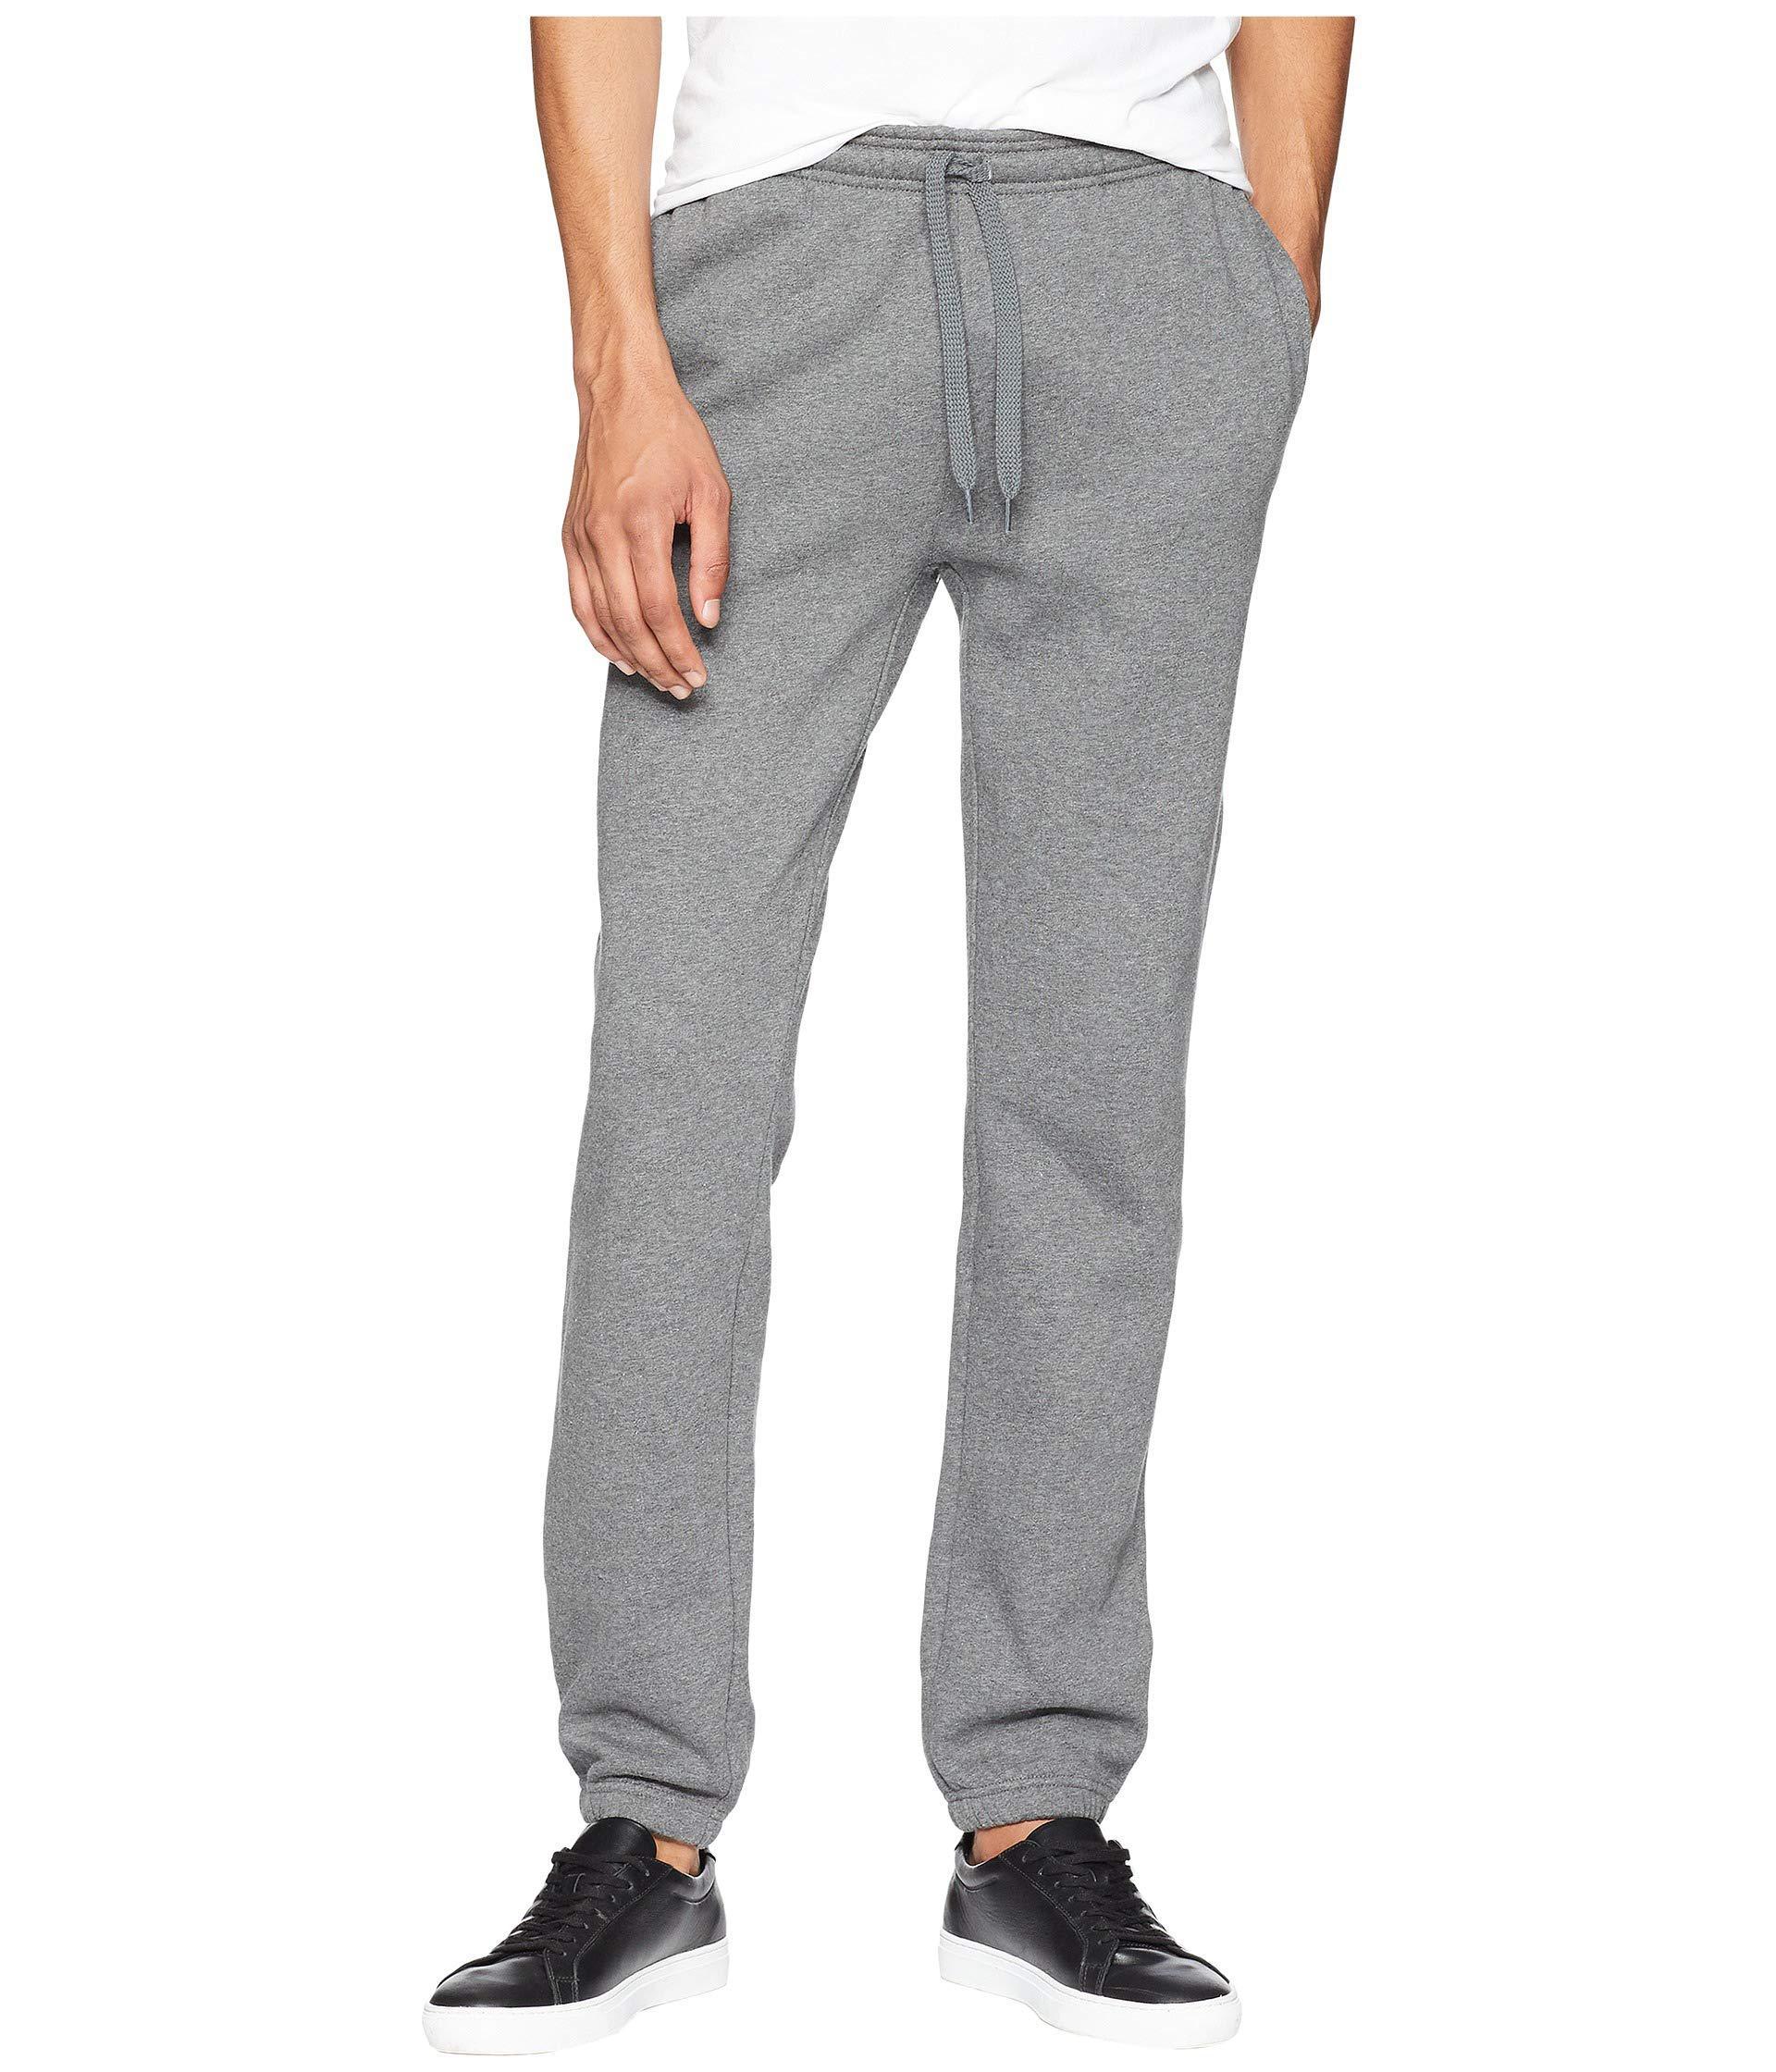 2c1de08735 Gray Sport Fleece Tennis Pants (pitch) Men's Casual Pants